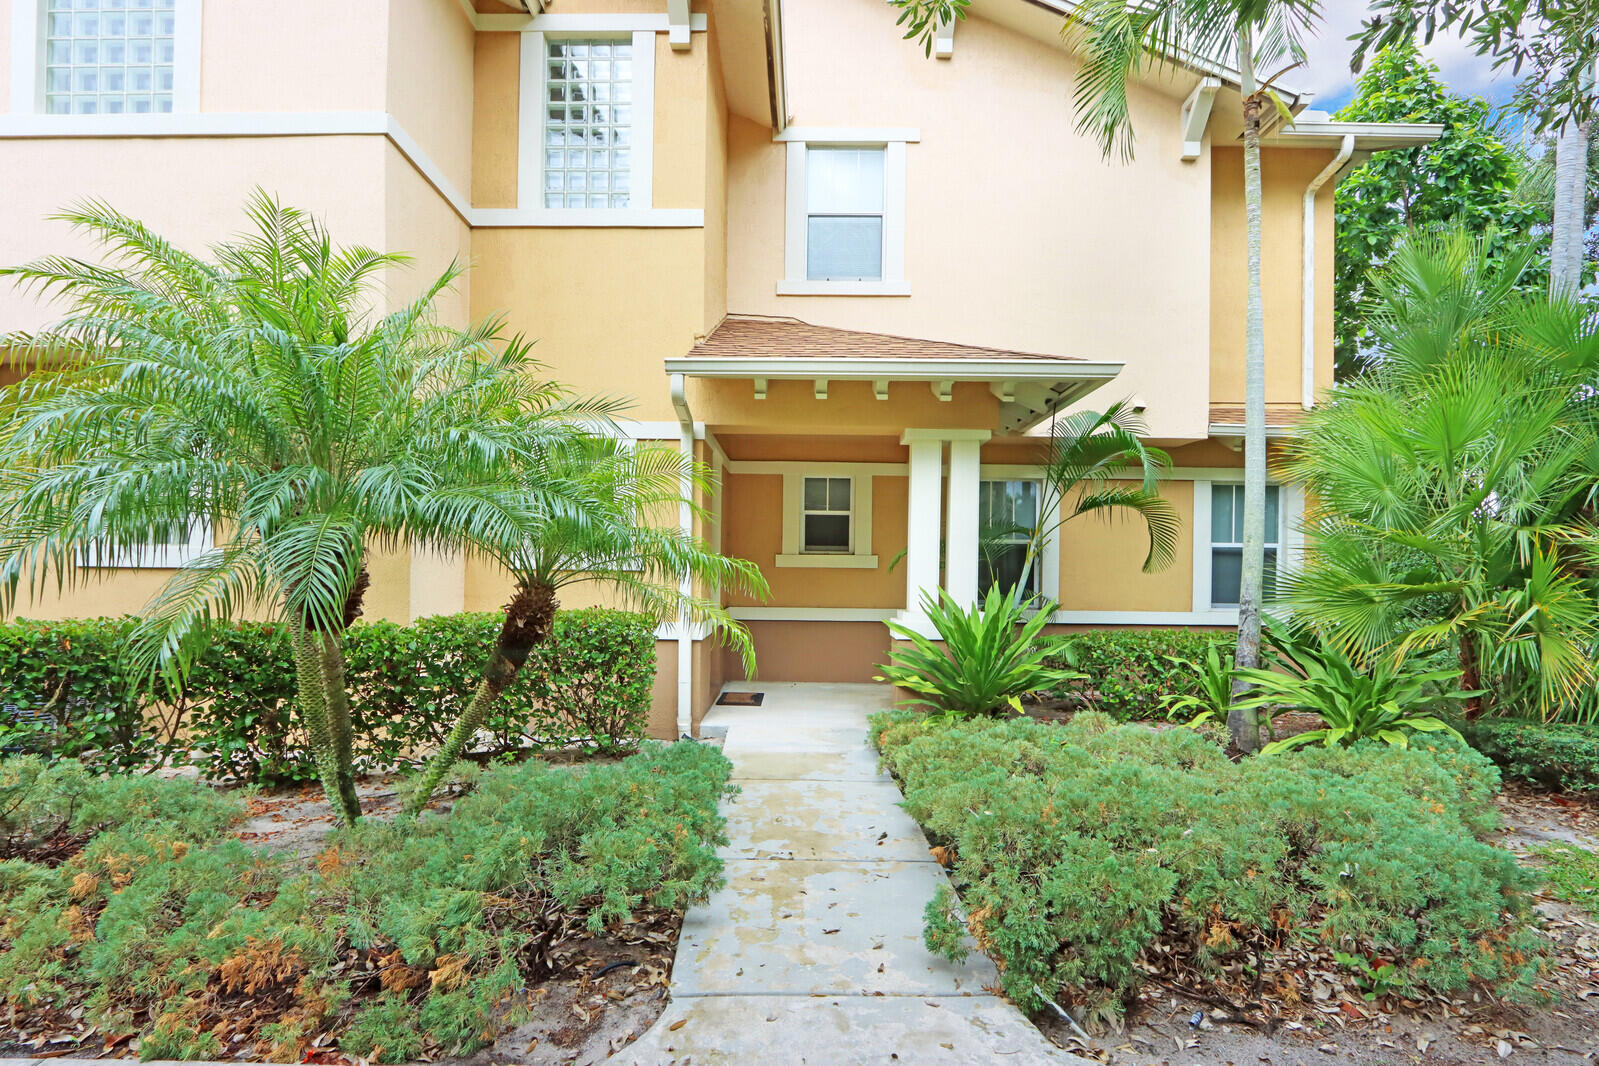 880  Millbrae Court 1 For Sale 10752432, FL